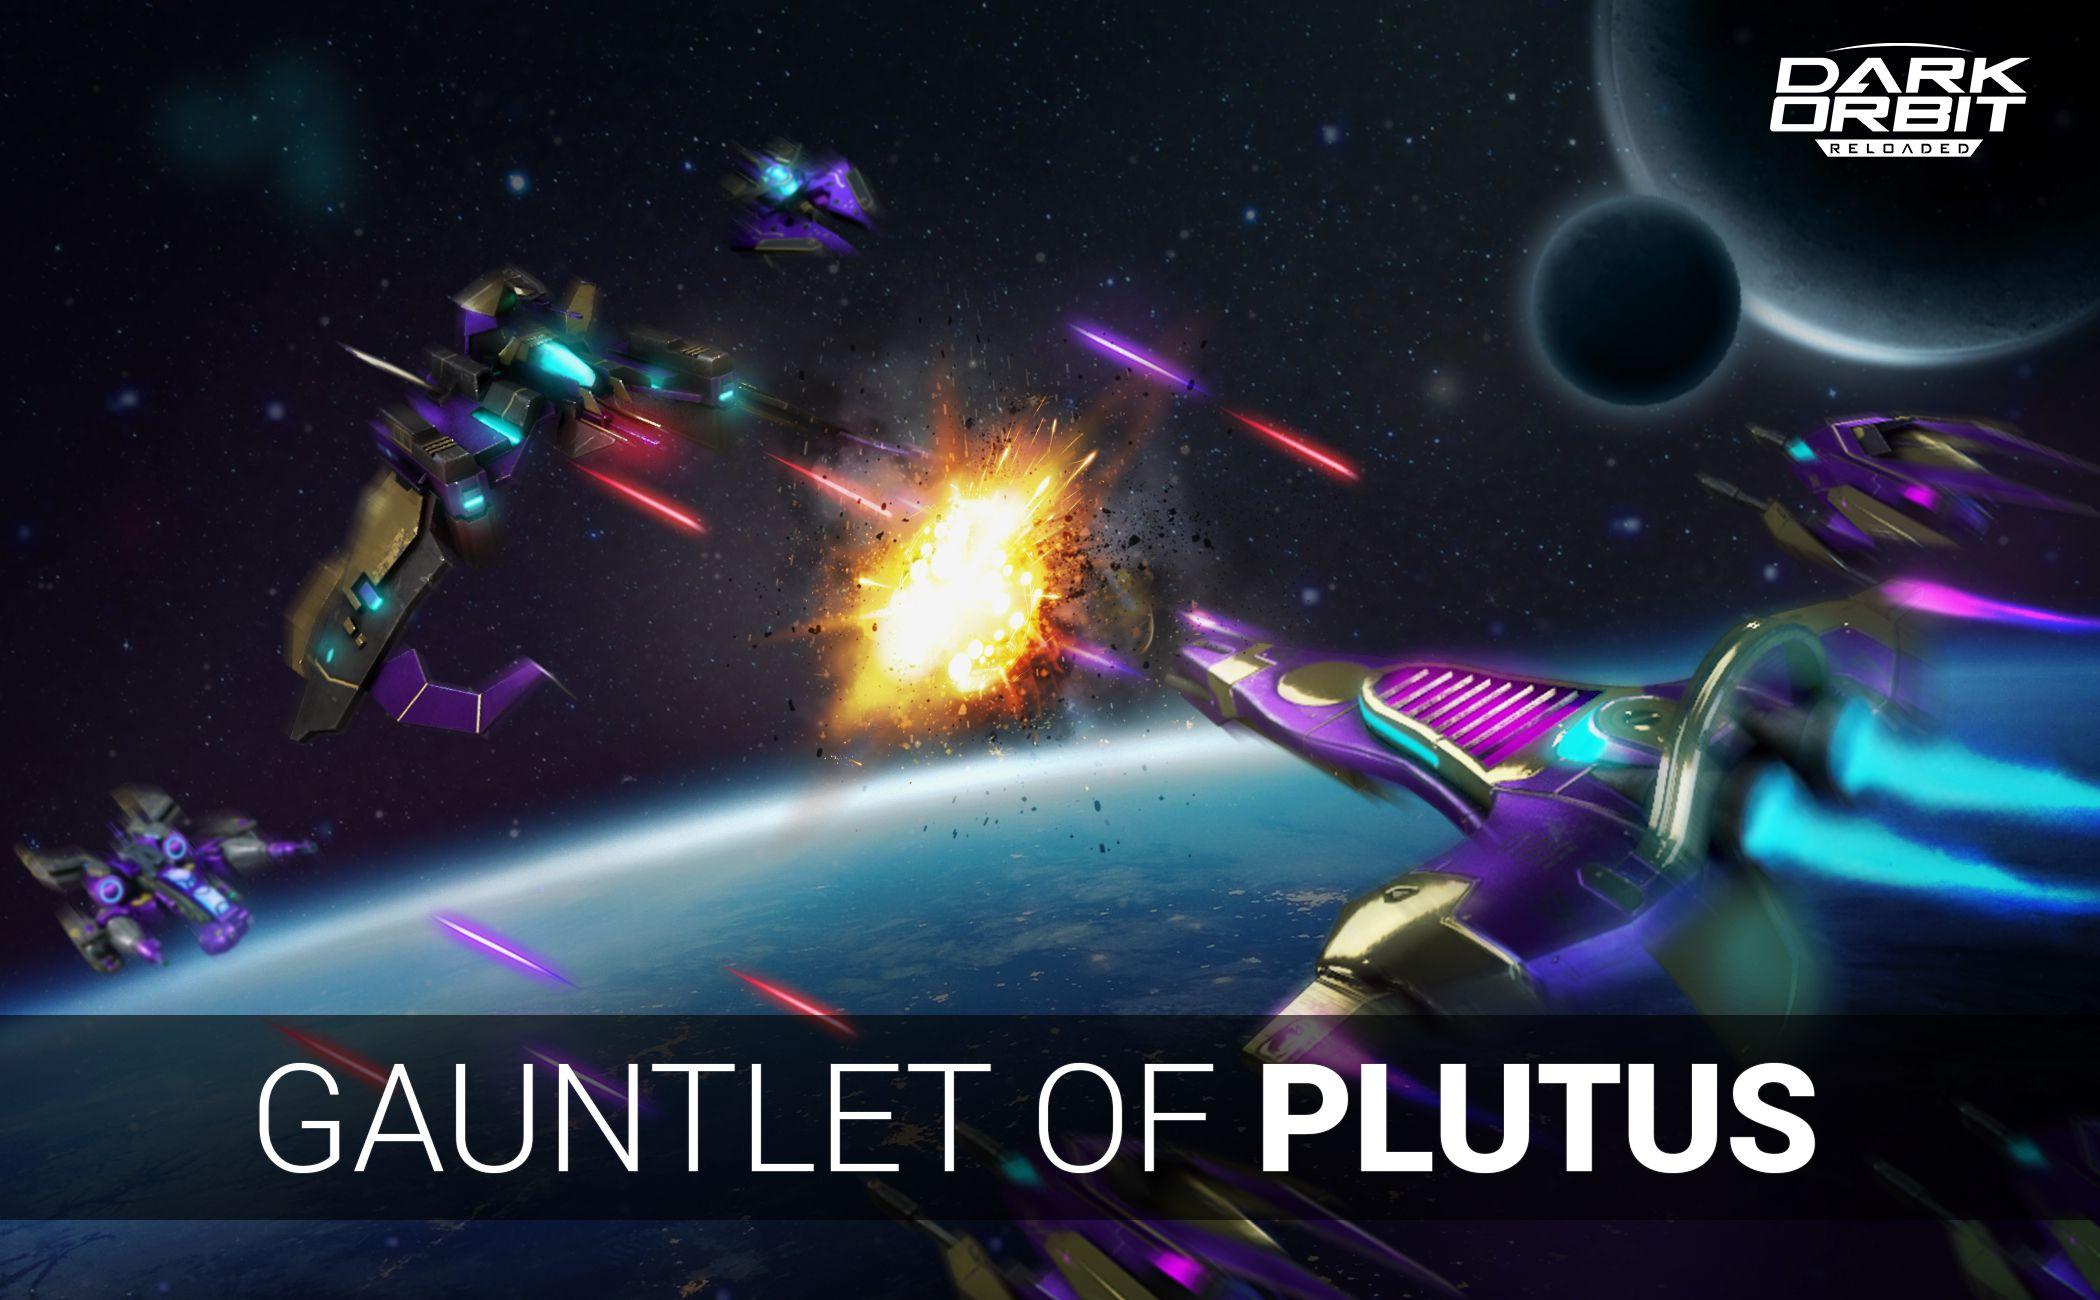 DO_marketing_gauntlet-of-plutus-1_201903.jpg